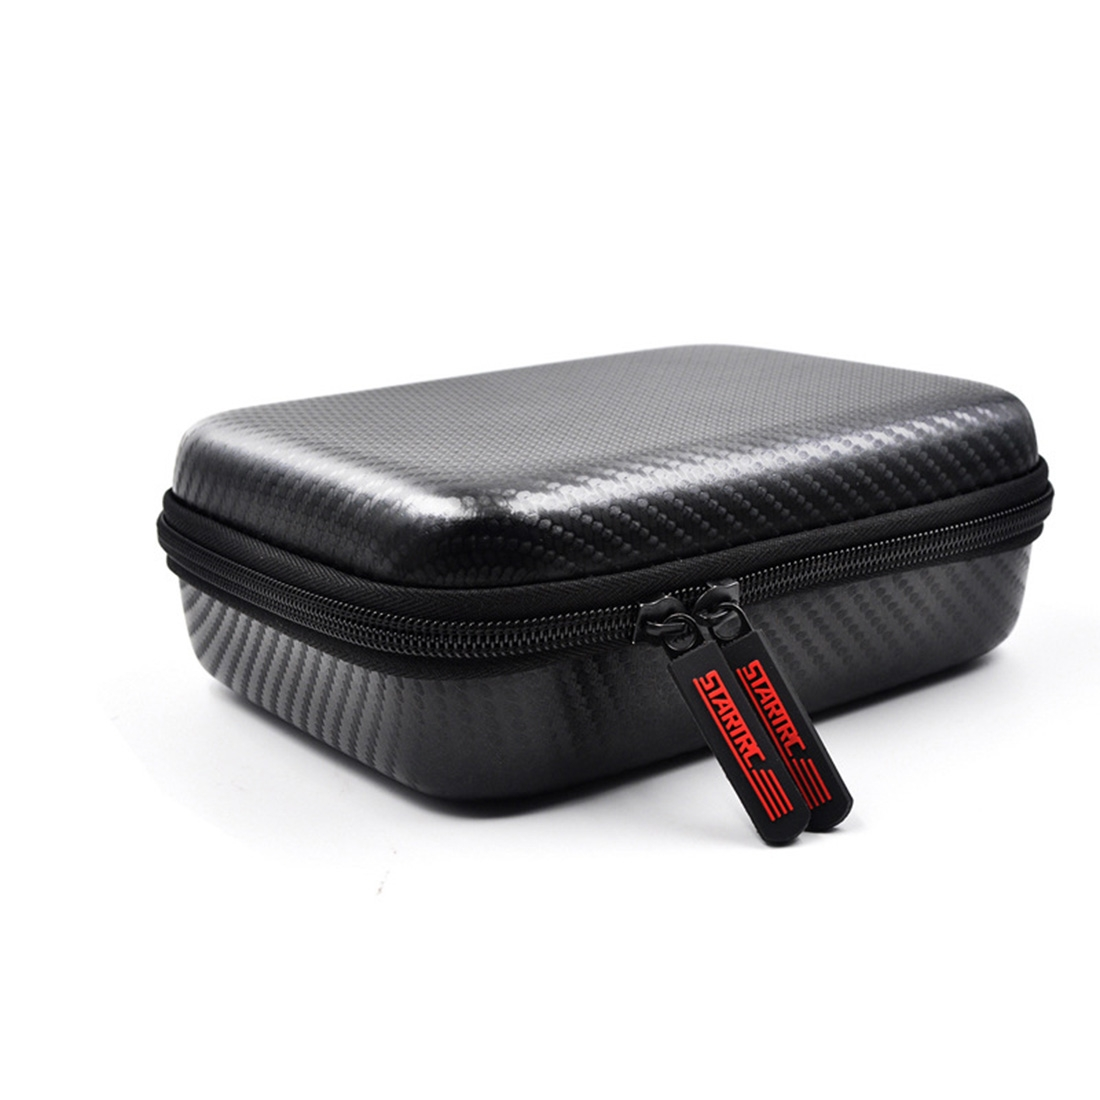 STARTRC Carbon Texture Waterproof PU Storage Bag for DJI OSMO Pocket Gimble Camera (Black)